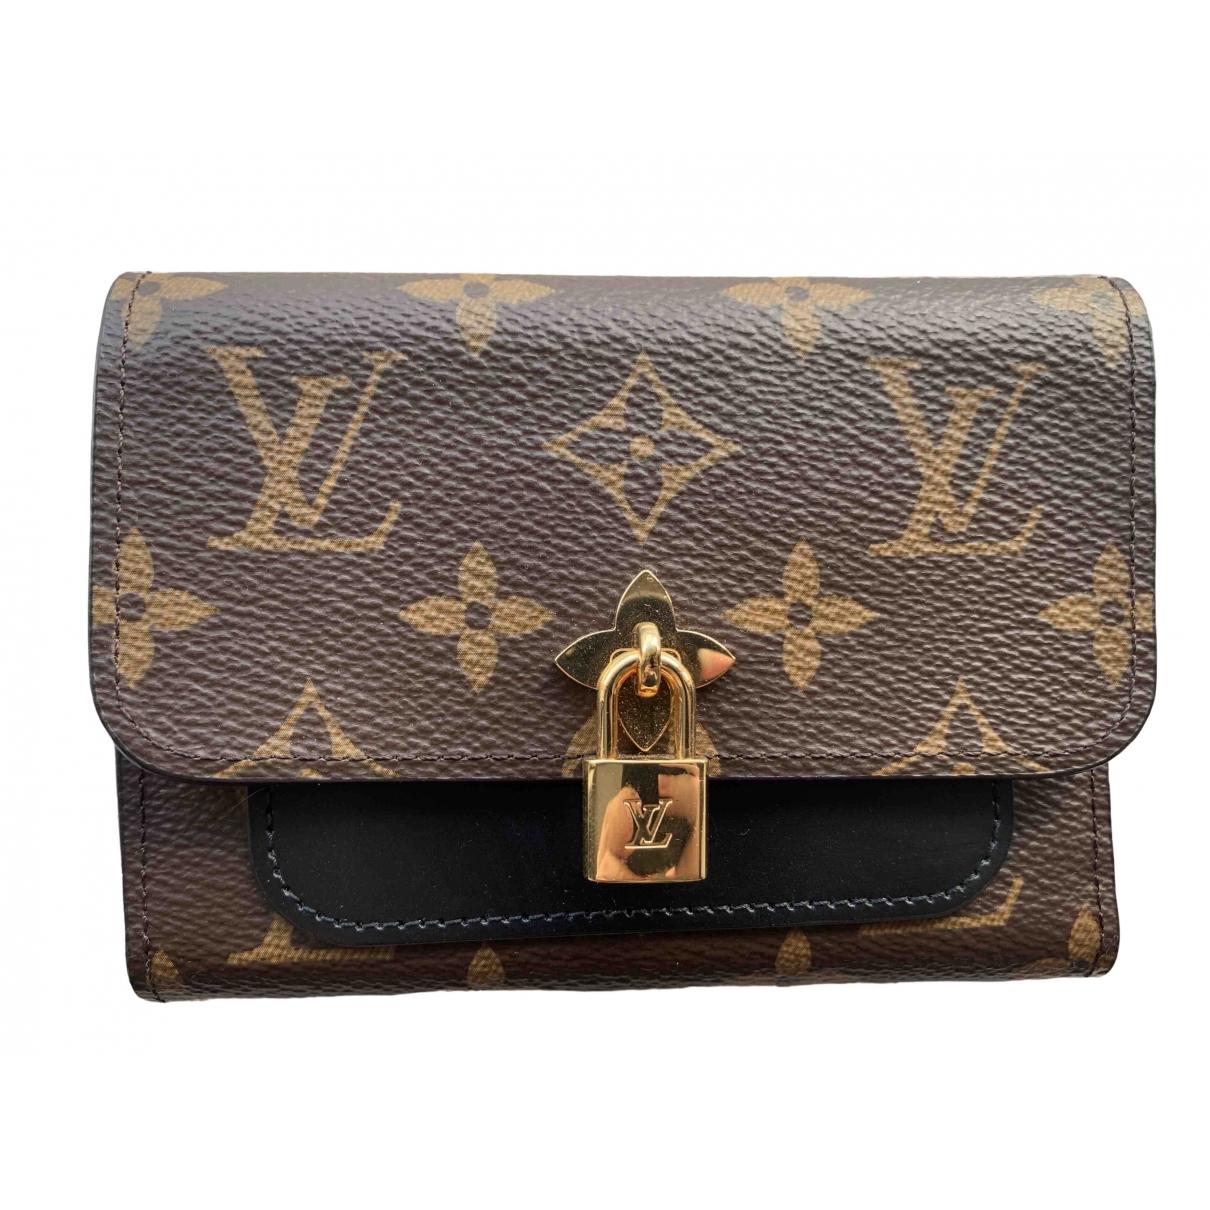 Cartera Marignan de Lona Louis Vuitton